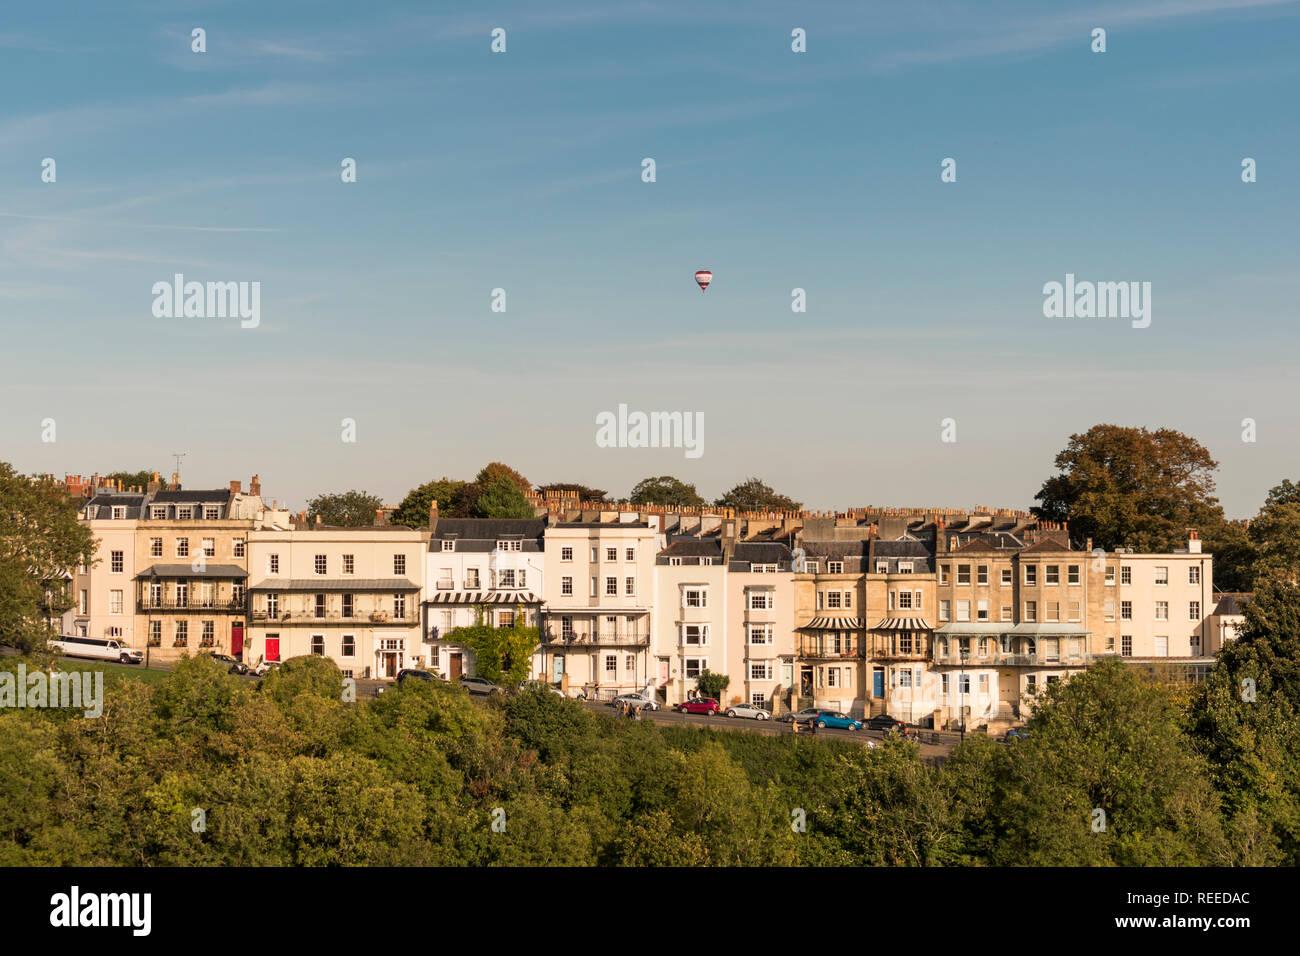 Views from the Clifton Suspension Bridge, Clifton, Bristol, UK Stock Photo